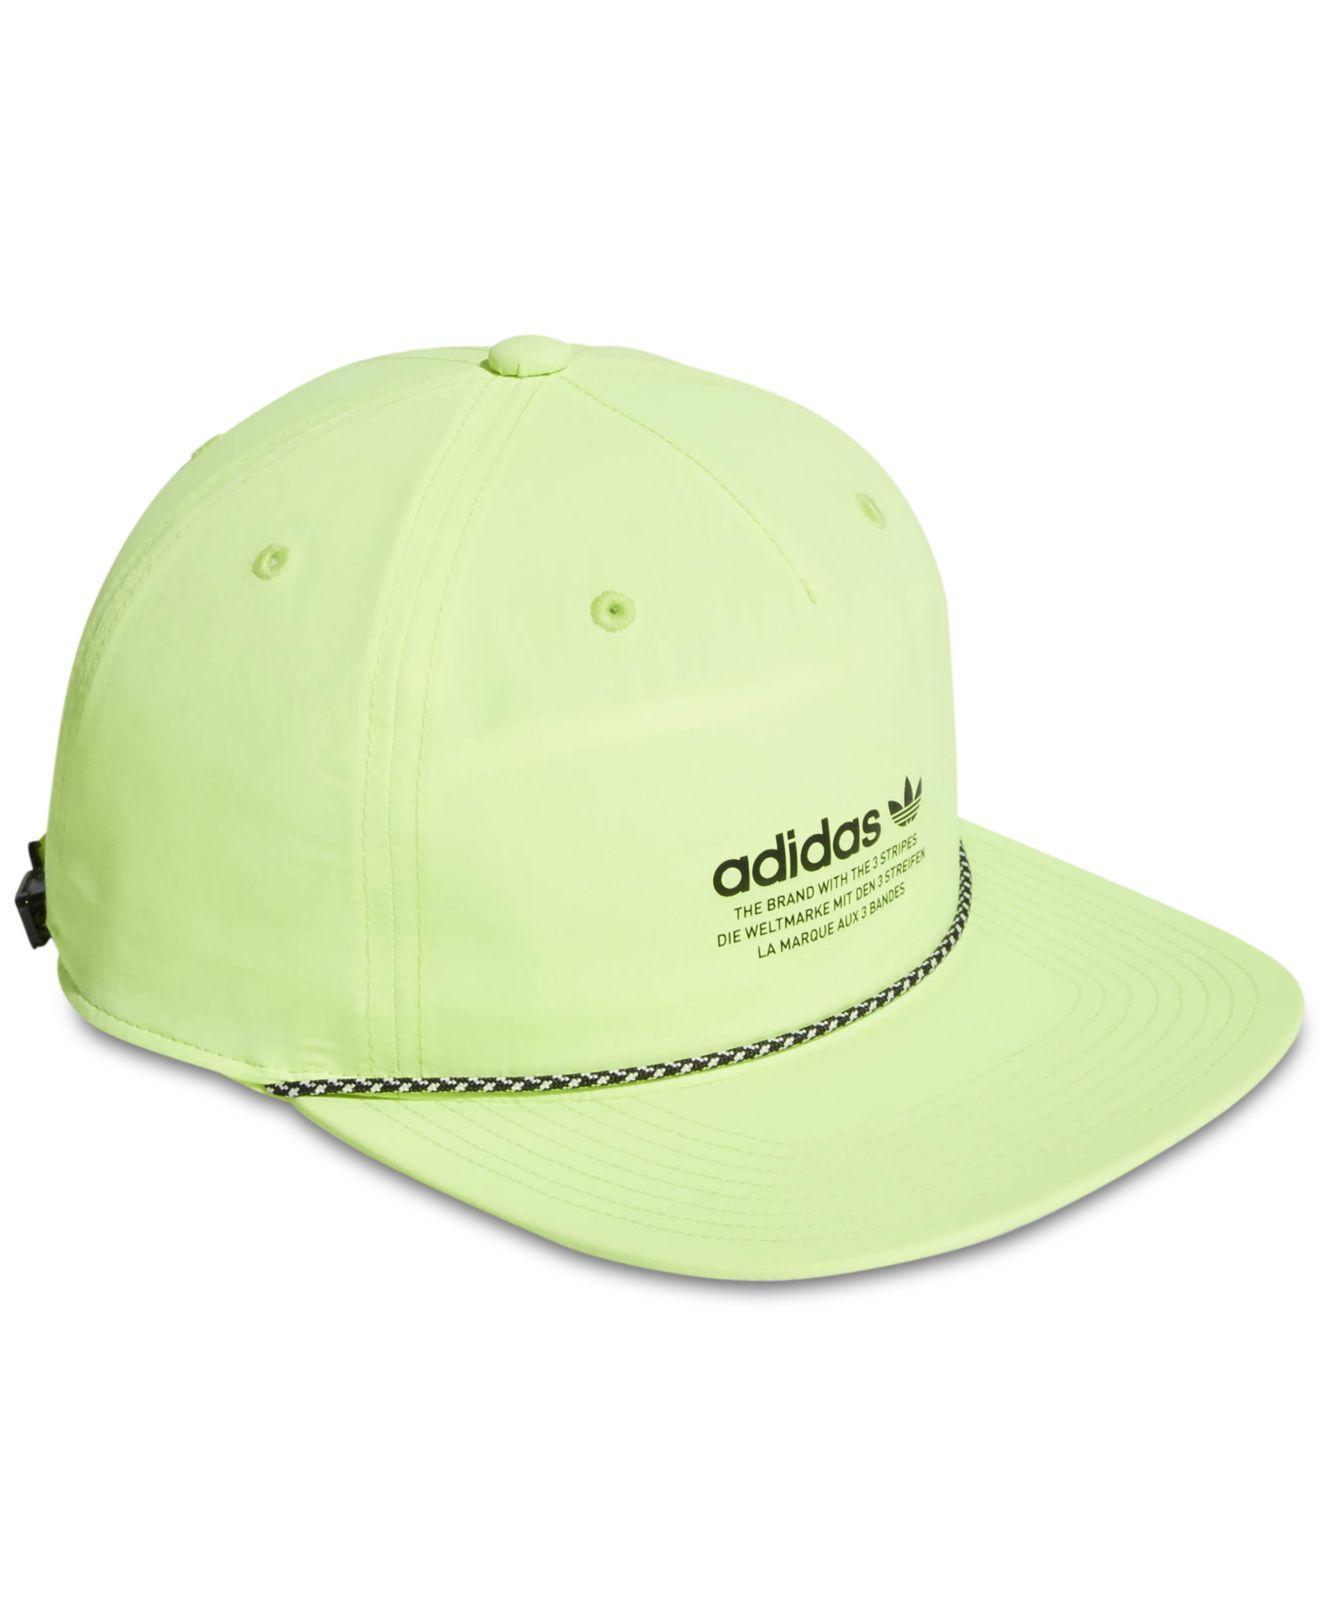 2f238502fdb45 Adidas - Yellow Originals Relaxed Logo Cap for Men - Lyst. View fullscreen